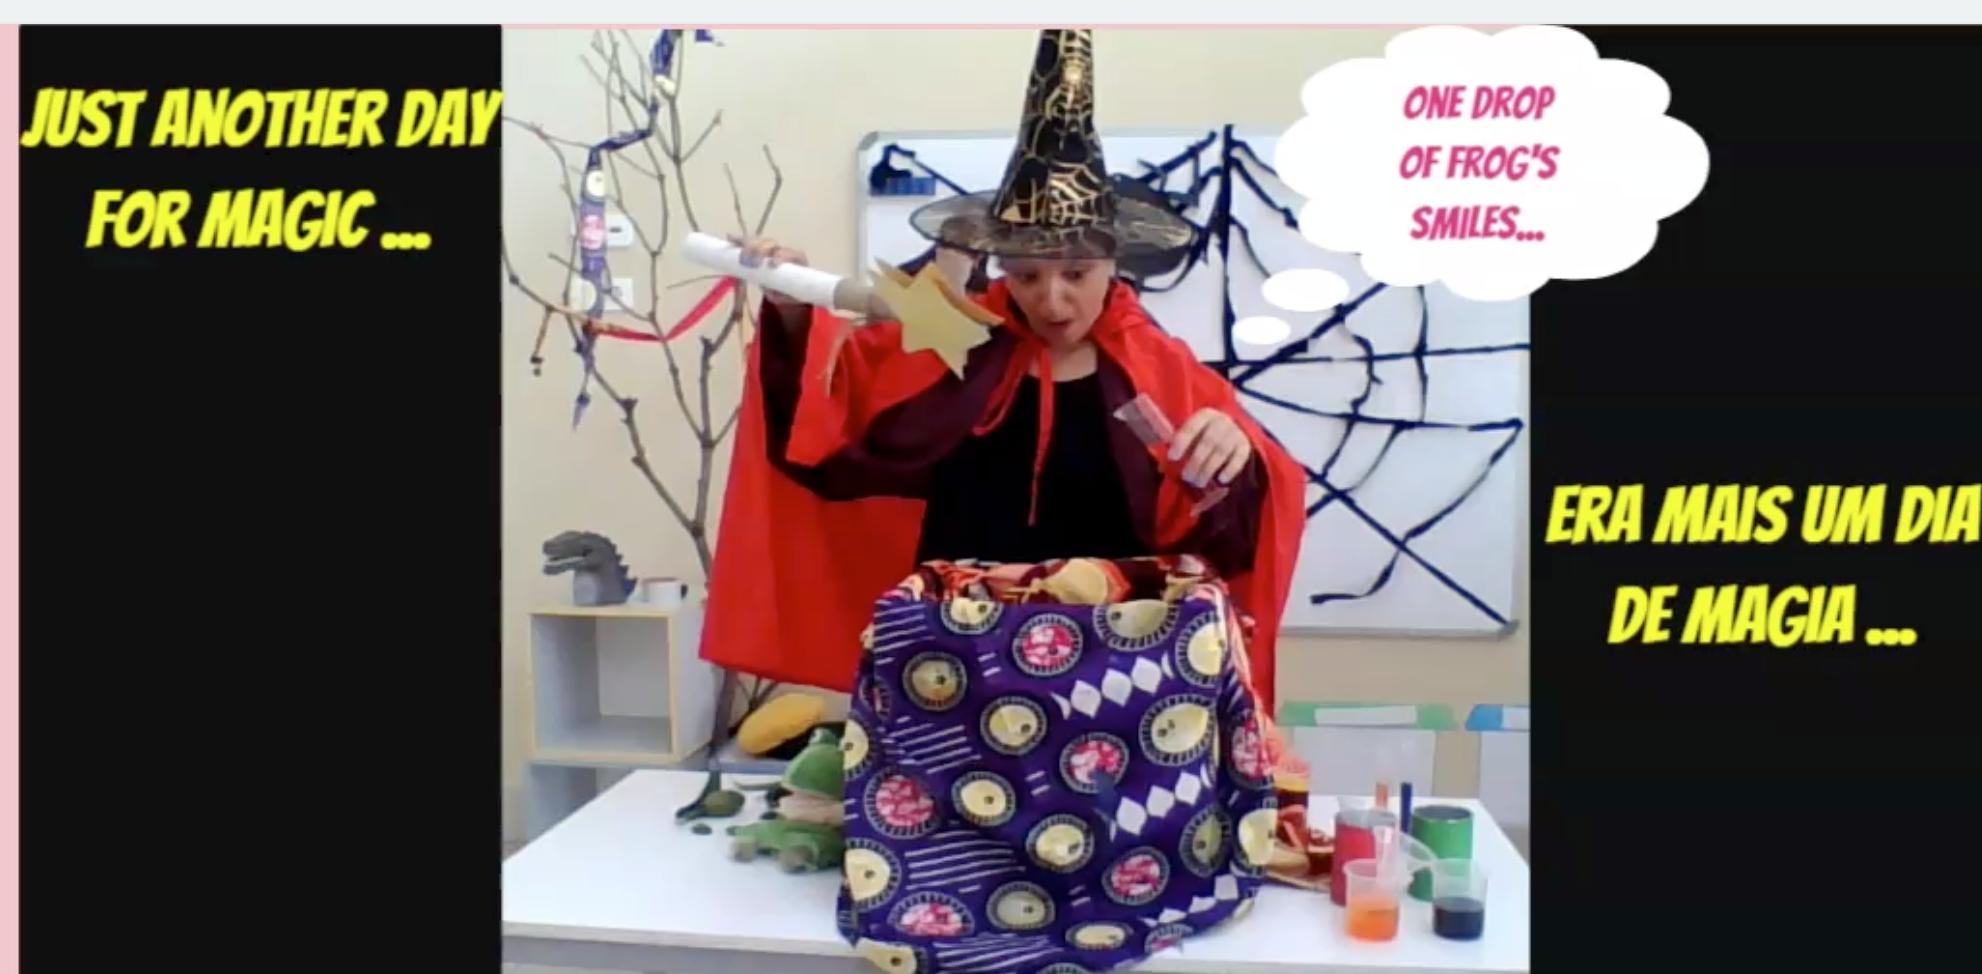 Zeezee the Wizard creating potions